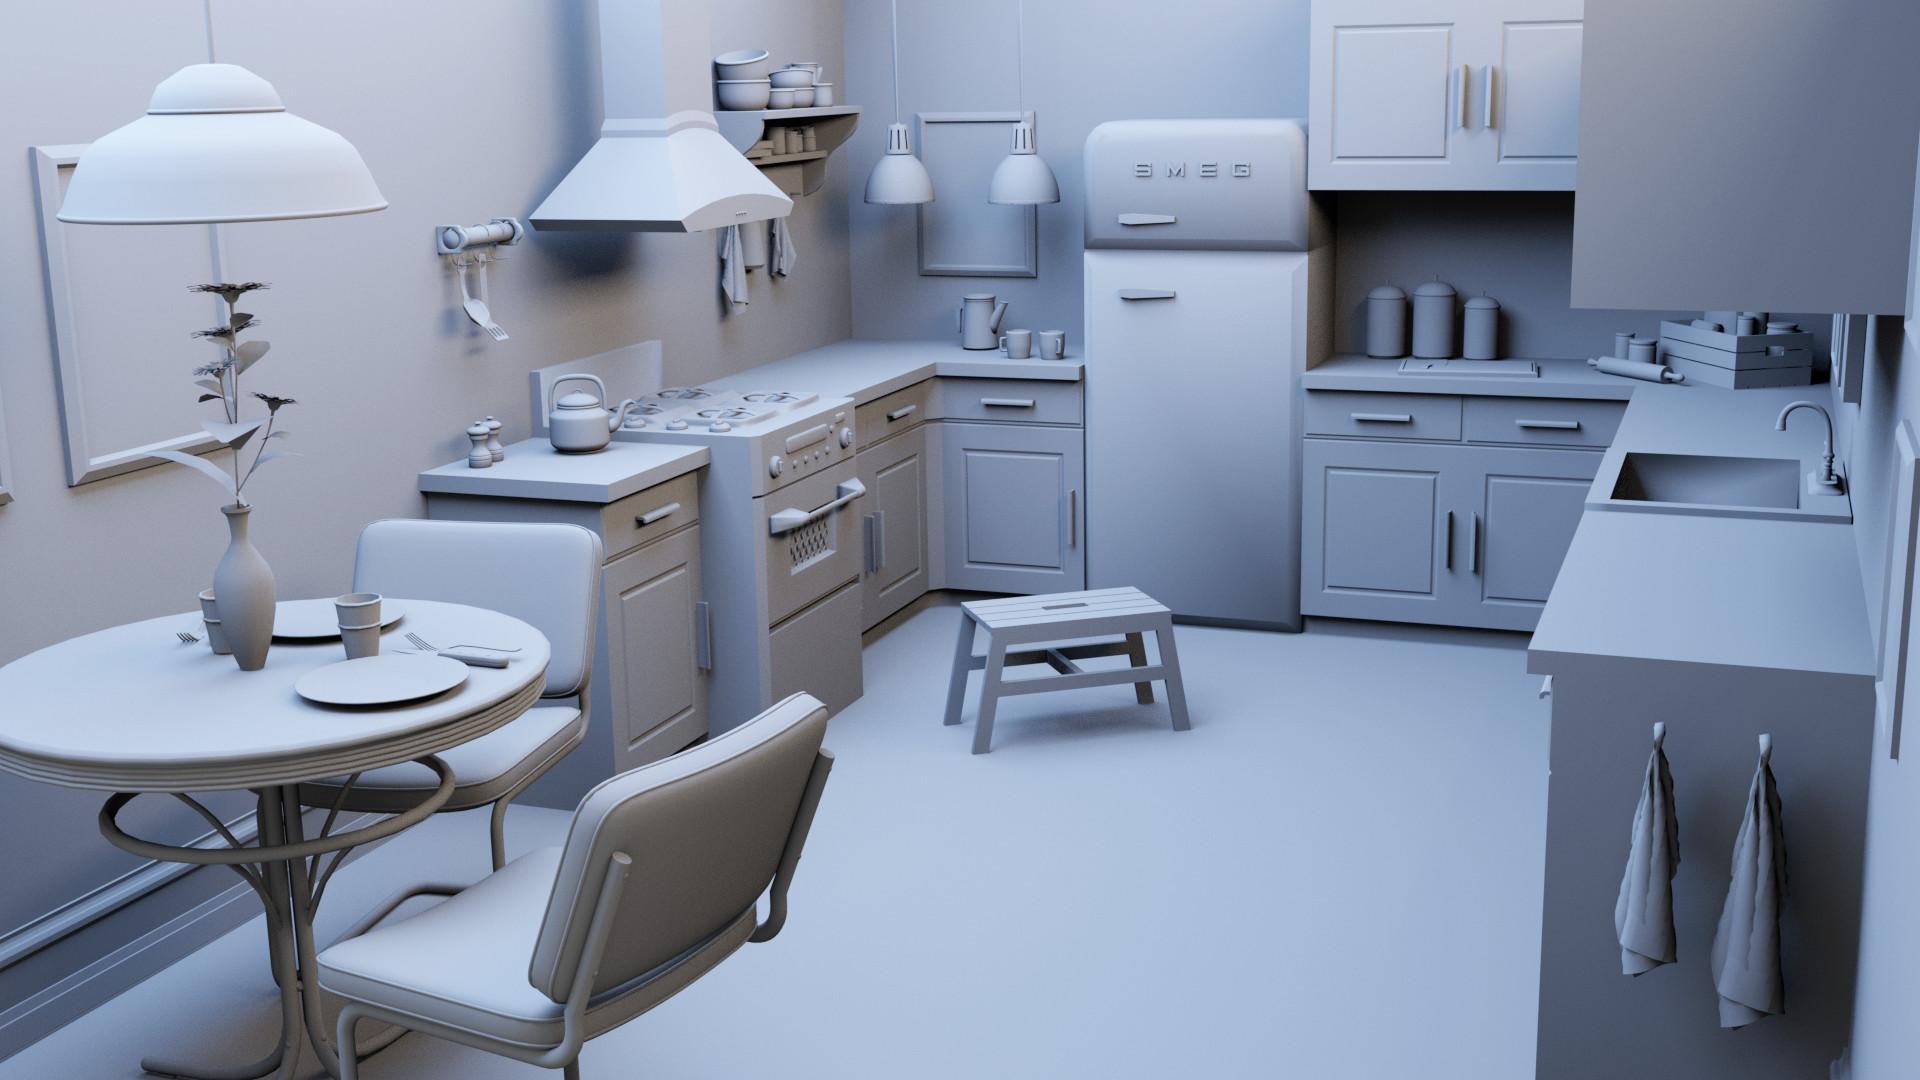 Mia Marié Boas - Tiny Spy - Kitchen Scene